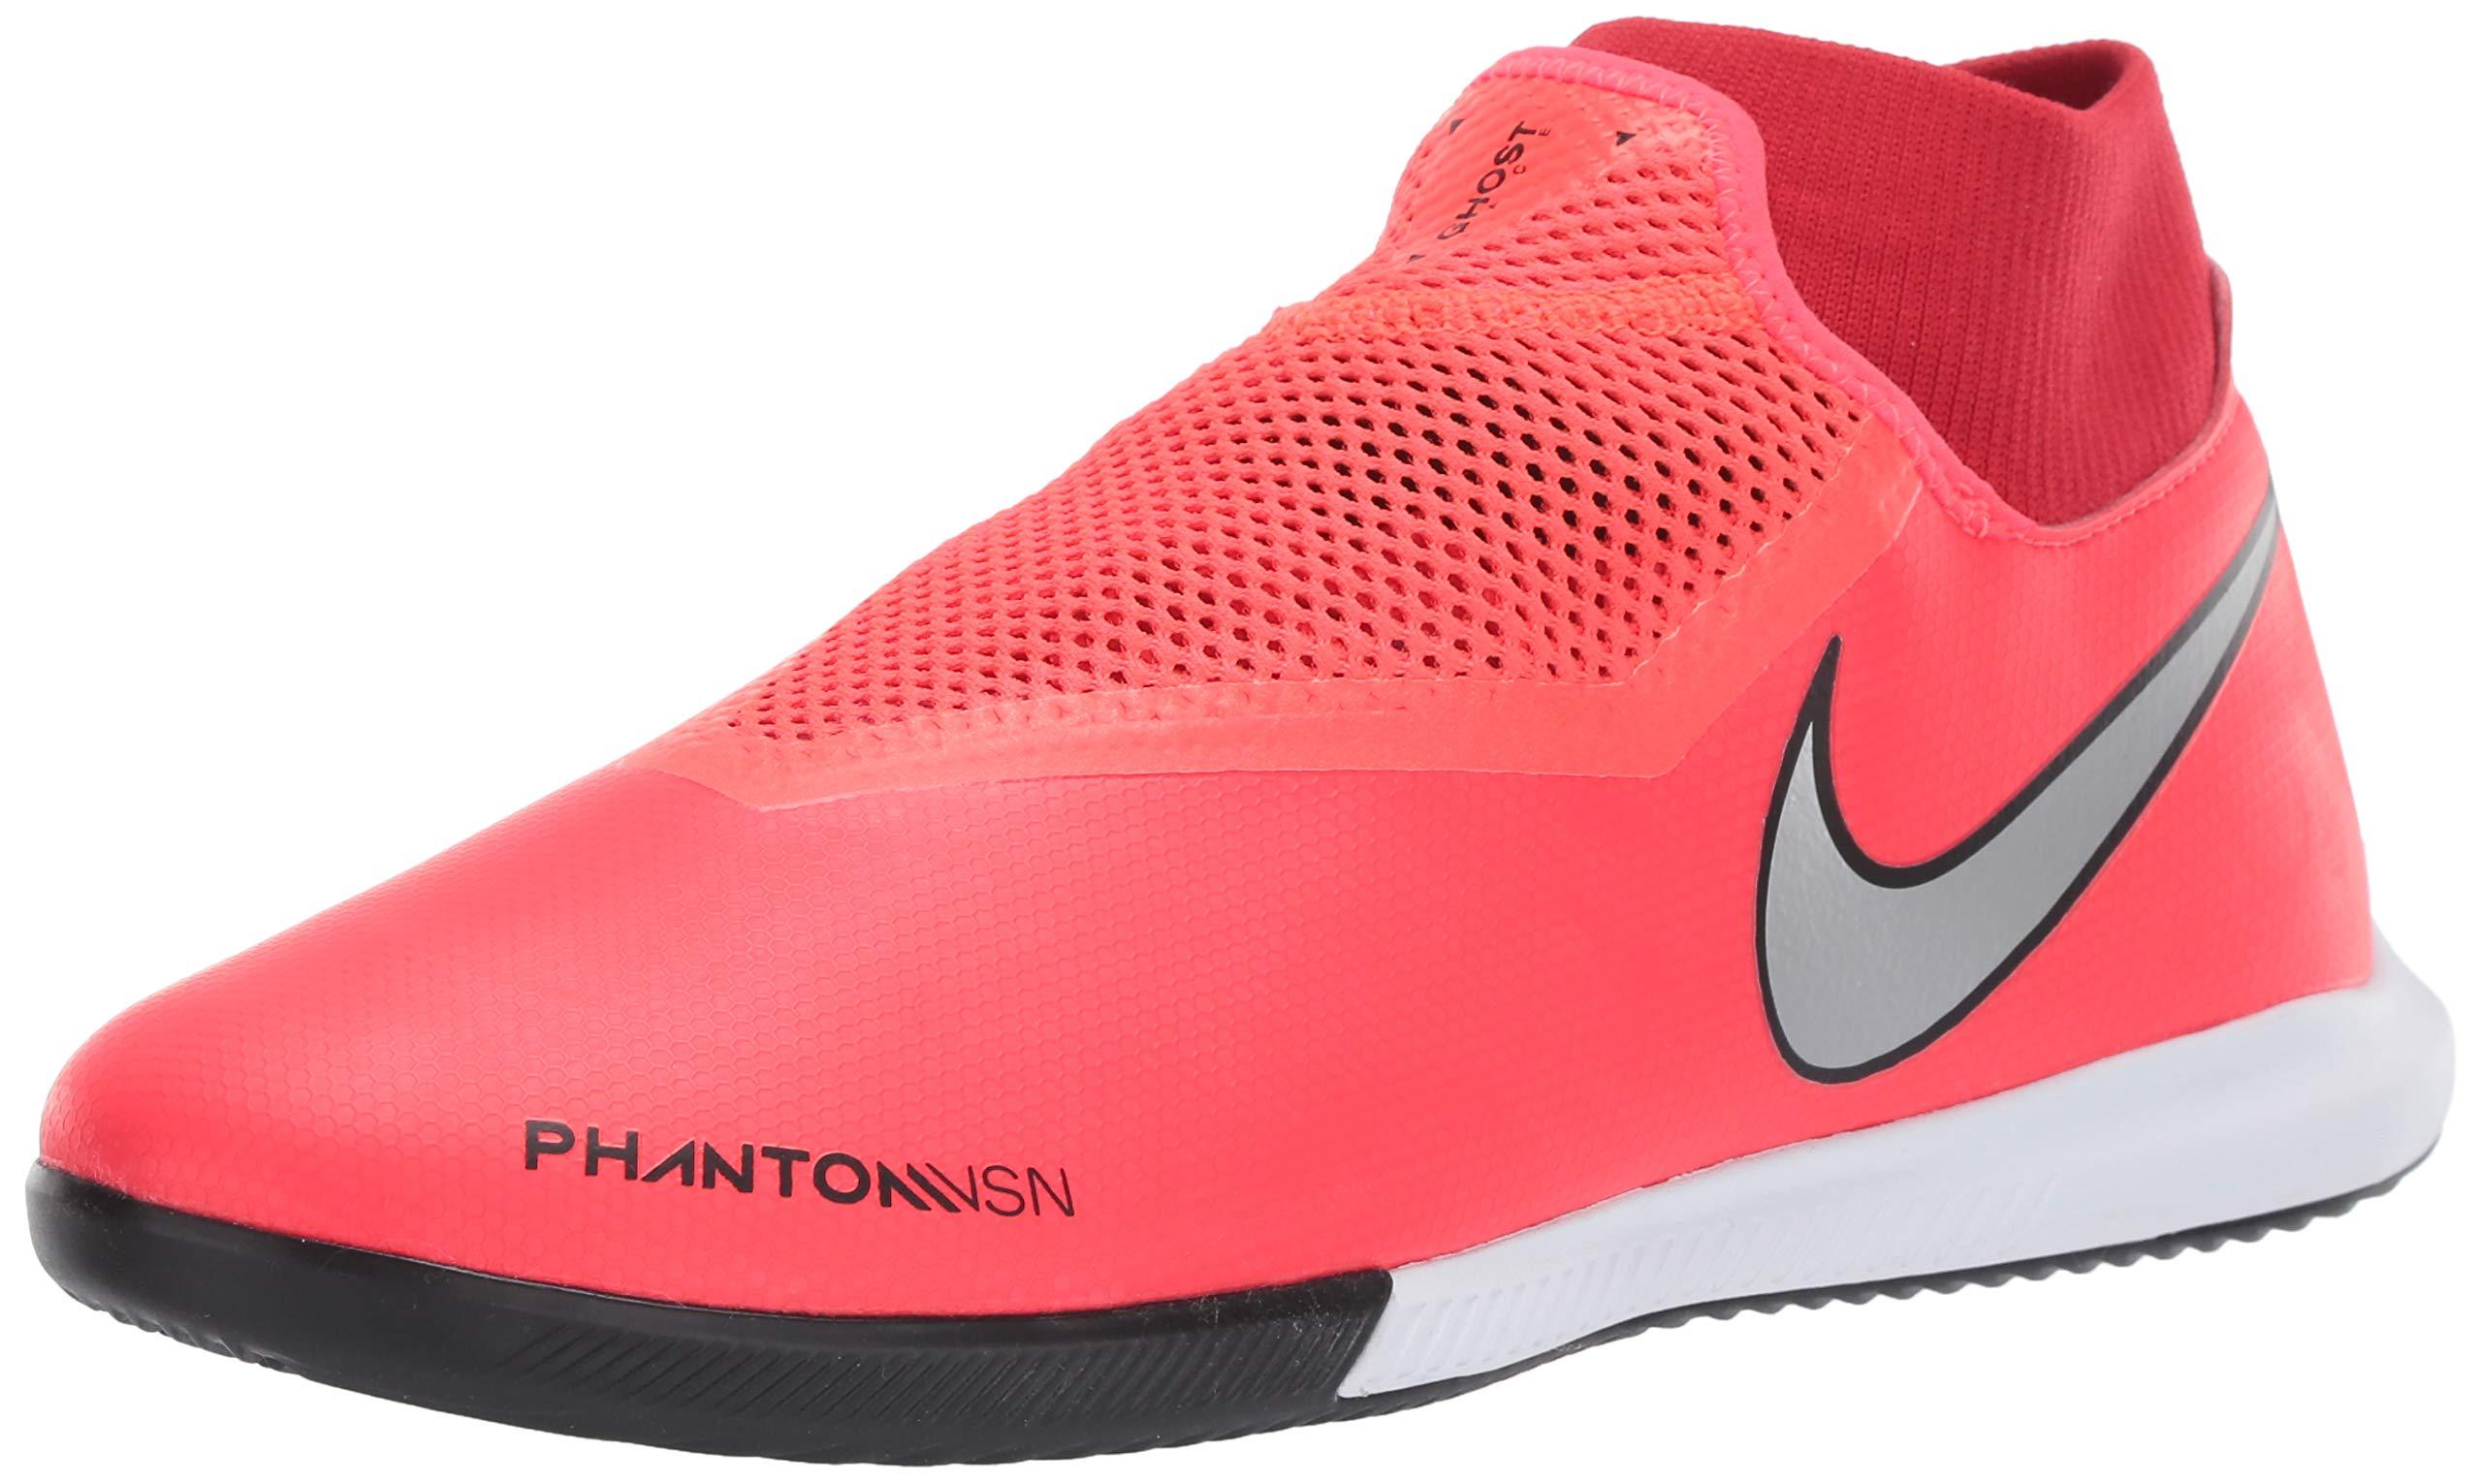 b98ea7c23e440 Galleon - Nike Men's Phantom VSN Academy DF IC Soccer Shoes (9.5 M ...